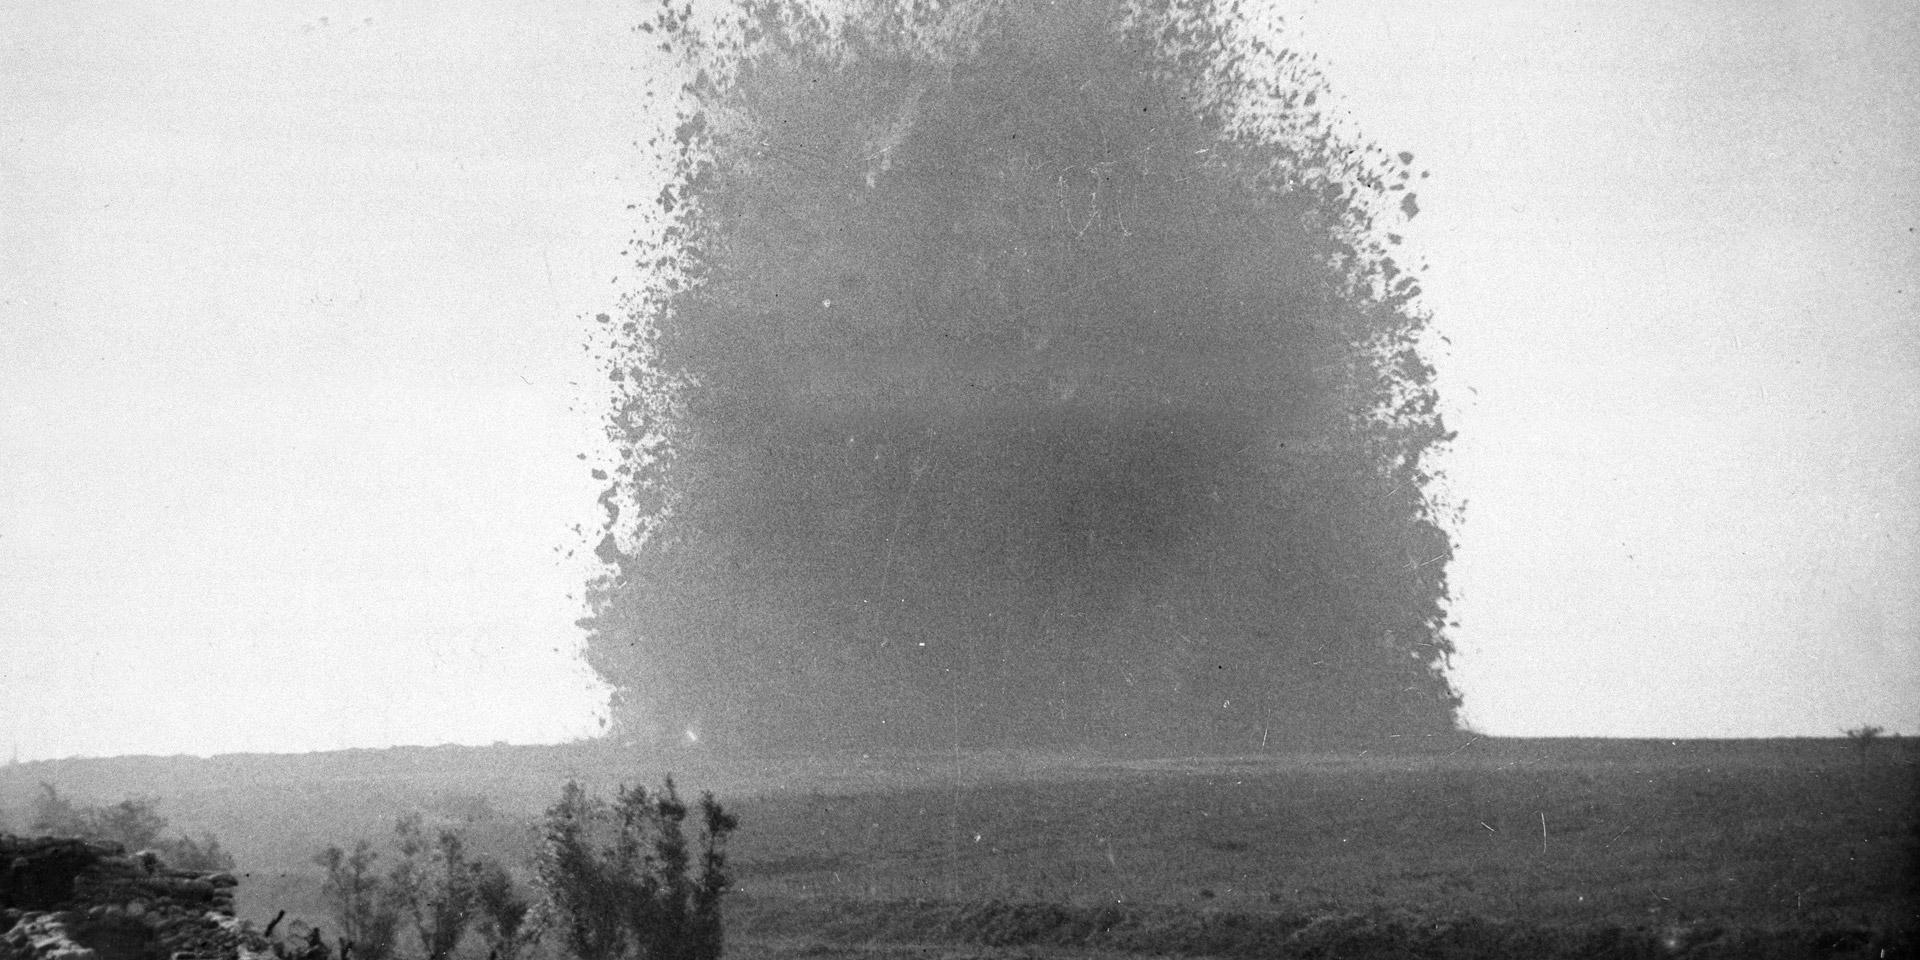 Mine detonating at Hawthorne Ridge during the Battle of the Somme, 1916